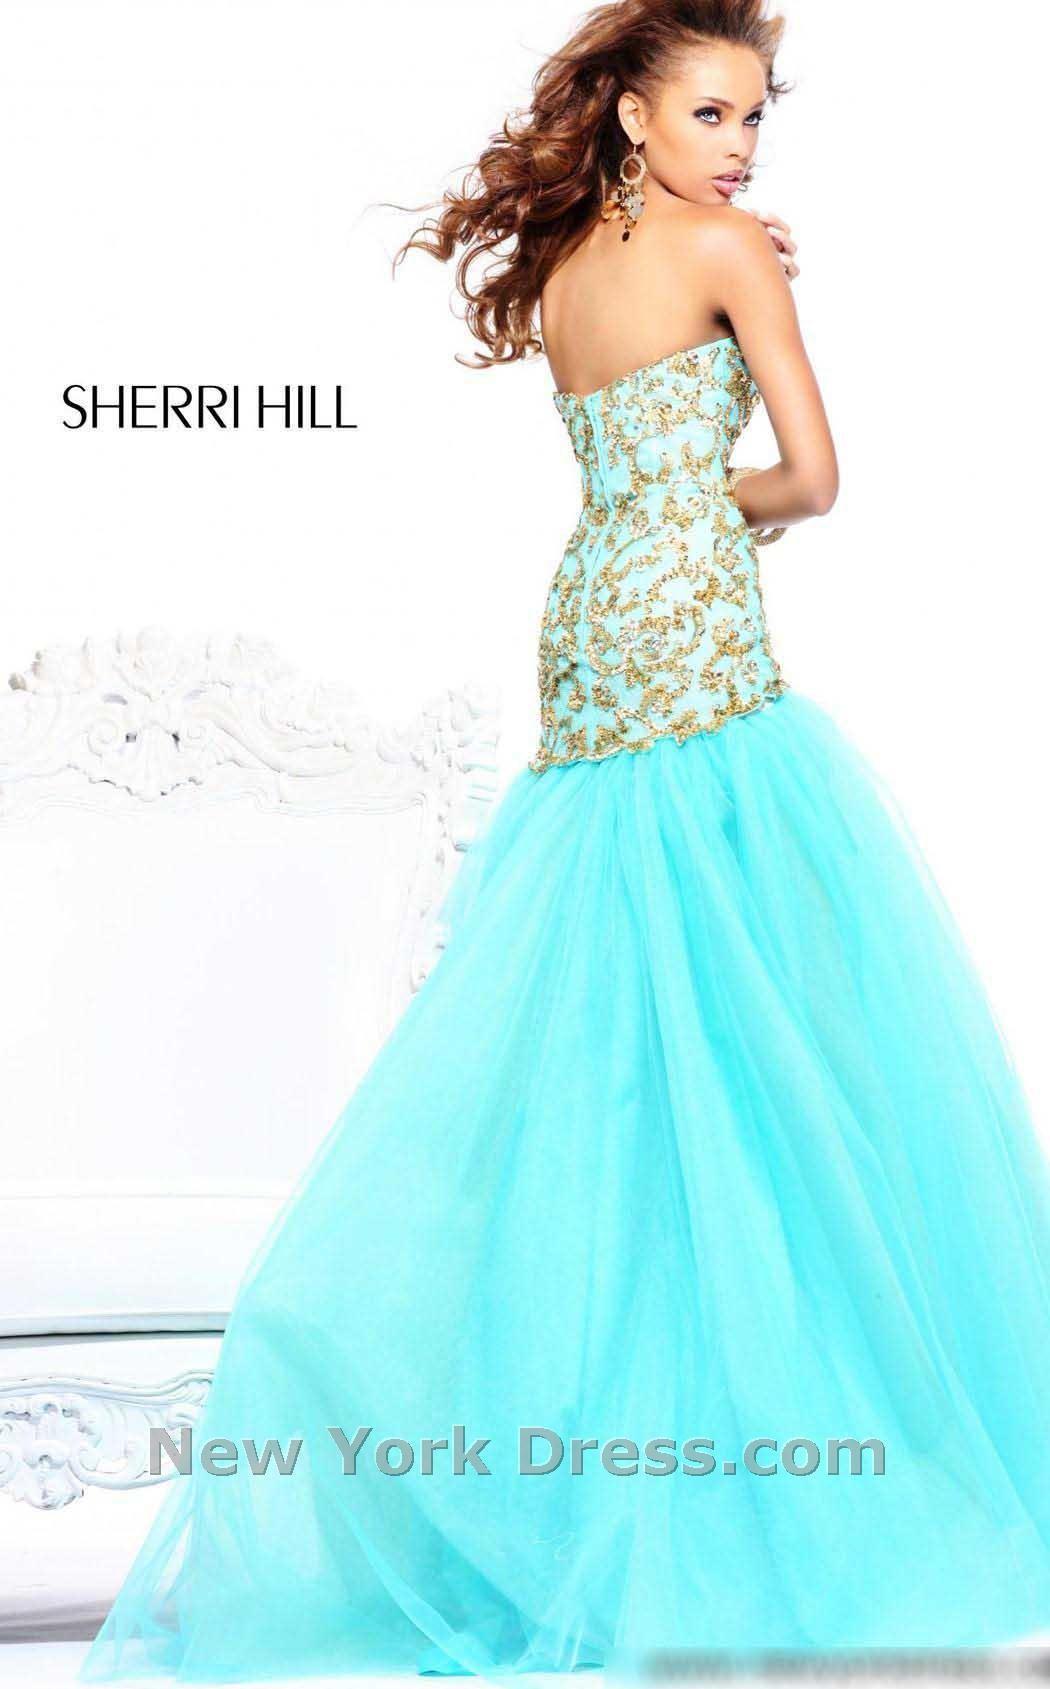 Luxury Sherri Hill 2013 Prom Dresses Model - All Wedding Dresses ...